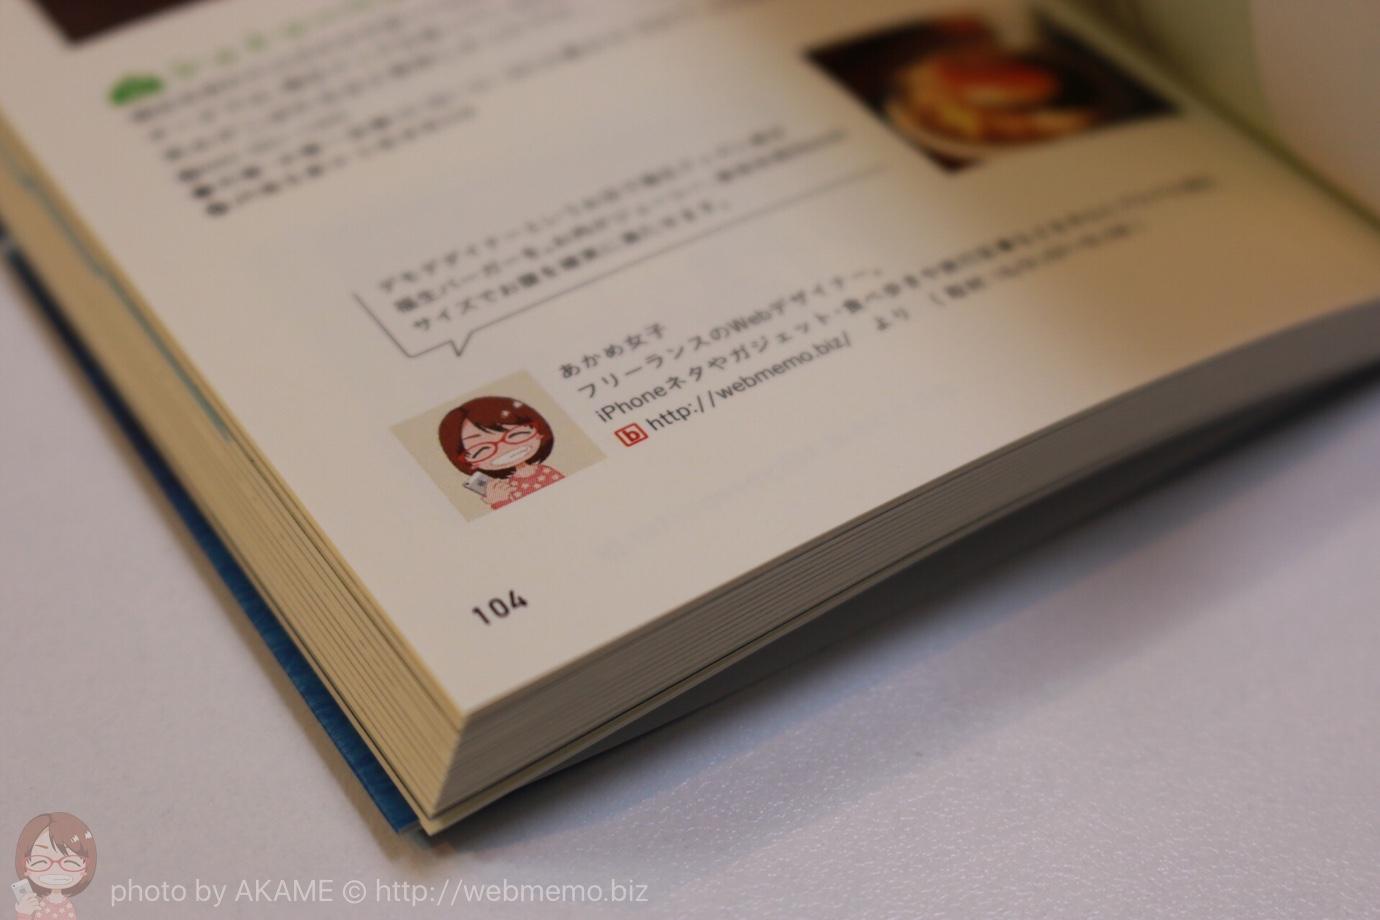 tokyo reporter 島旅&山旅 プロフィール紹介